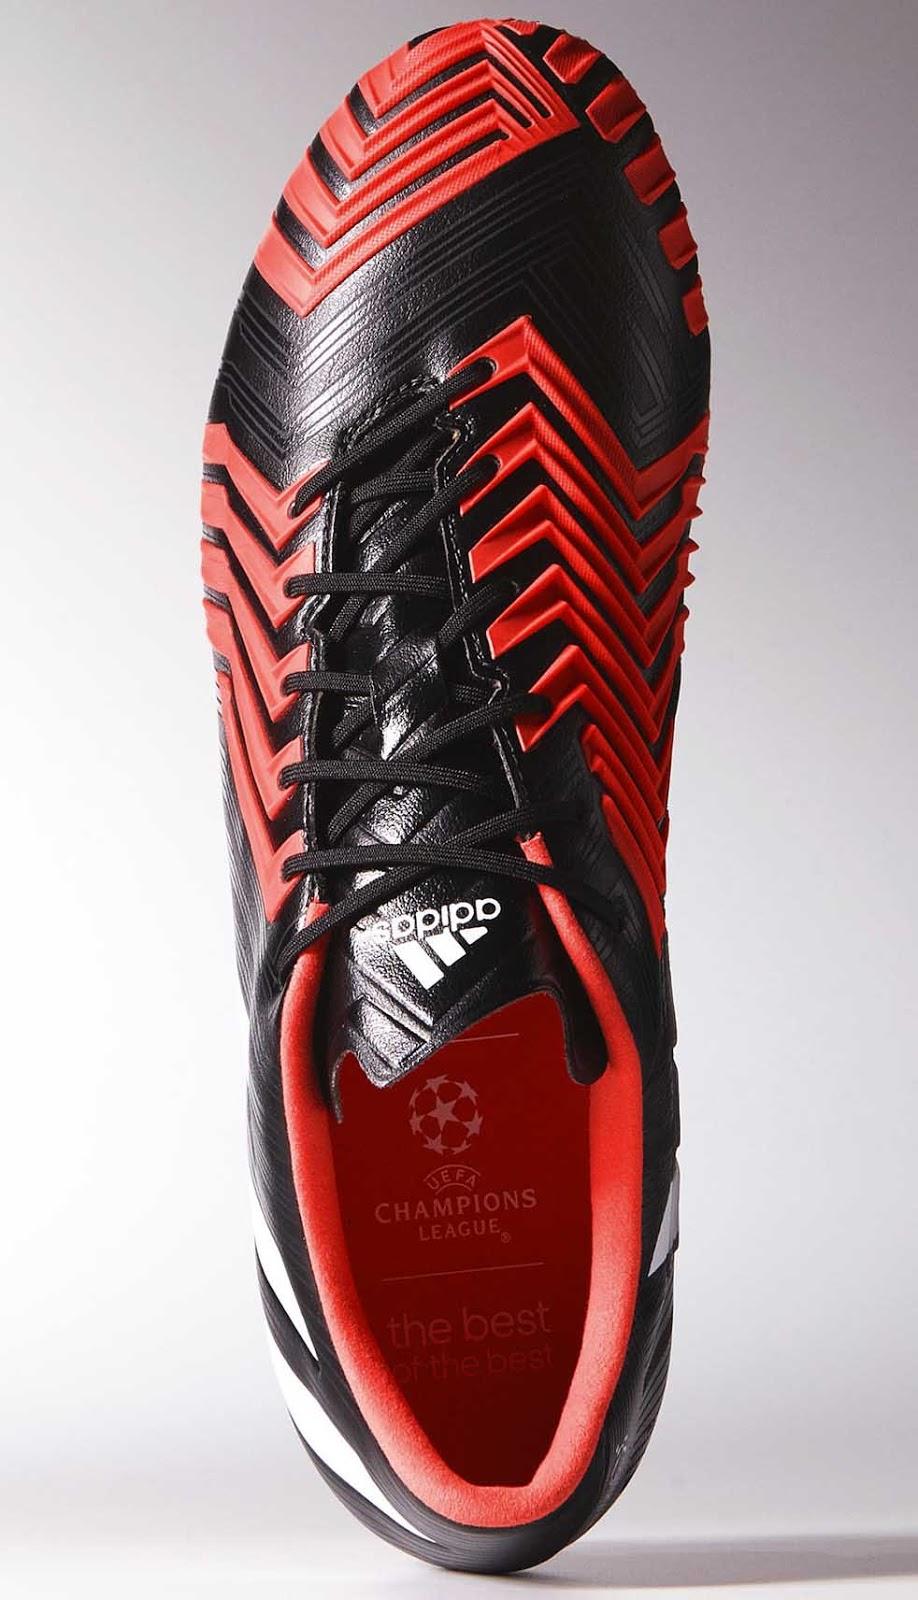 Black-Red-Adidas-Predator-Instinct-2